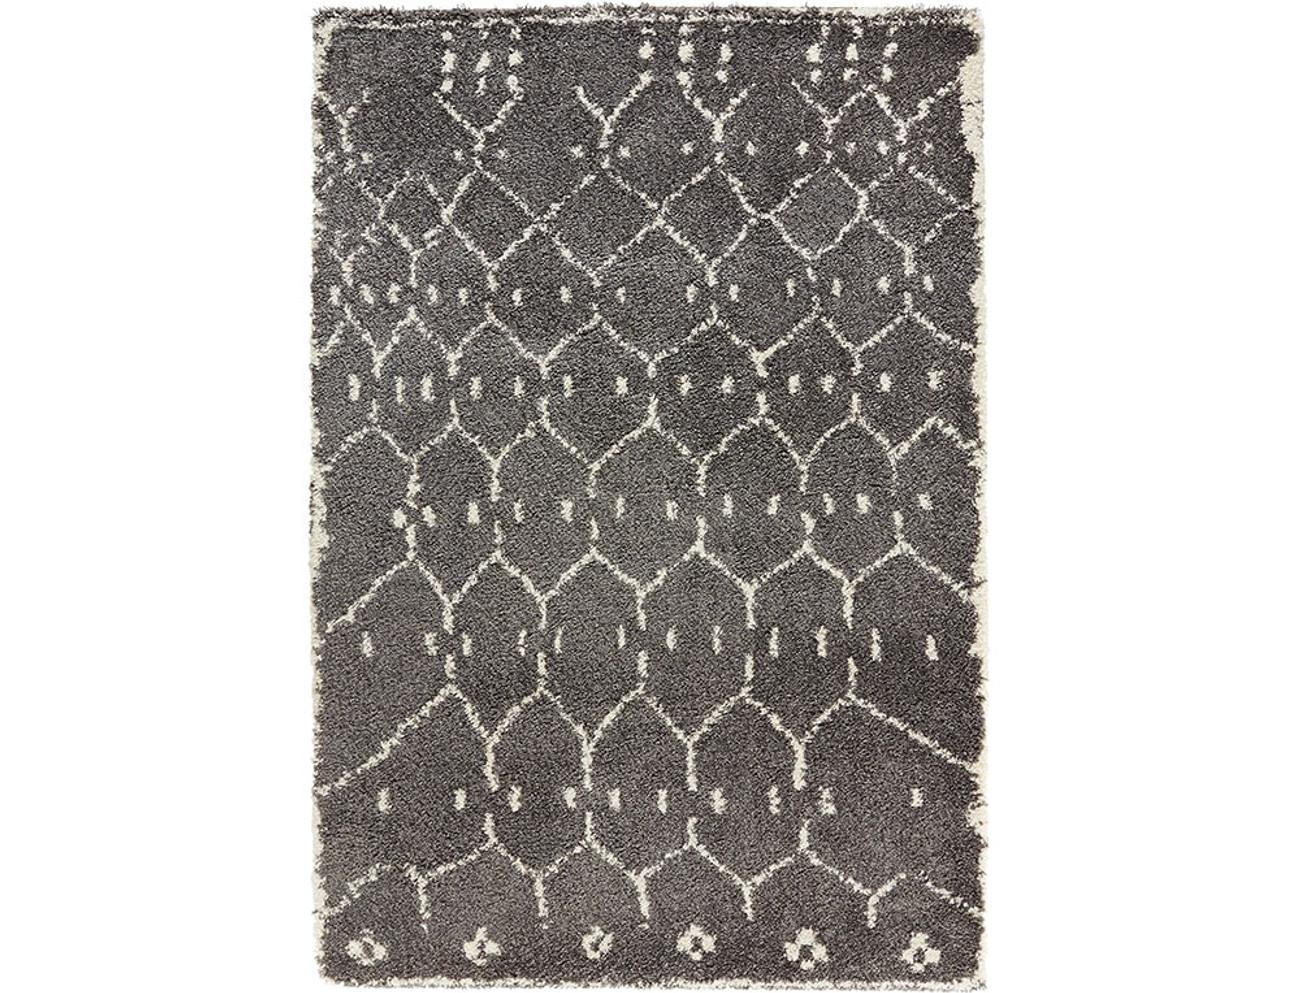 design velours teppich hochflor frame grau teppiche hochflor teppiche. Black Bedroom Furniture Sets. Home Design Ideas